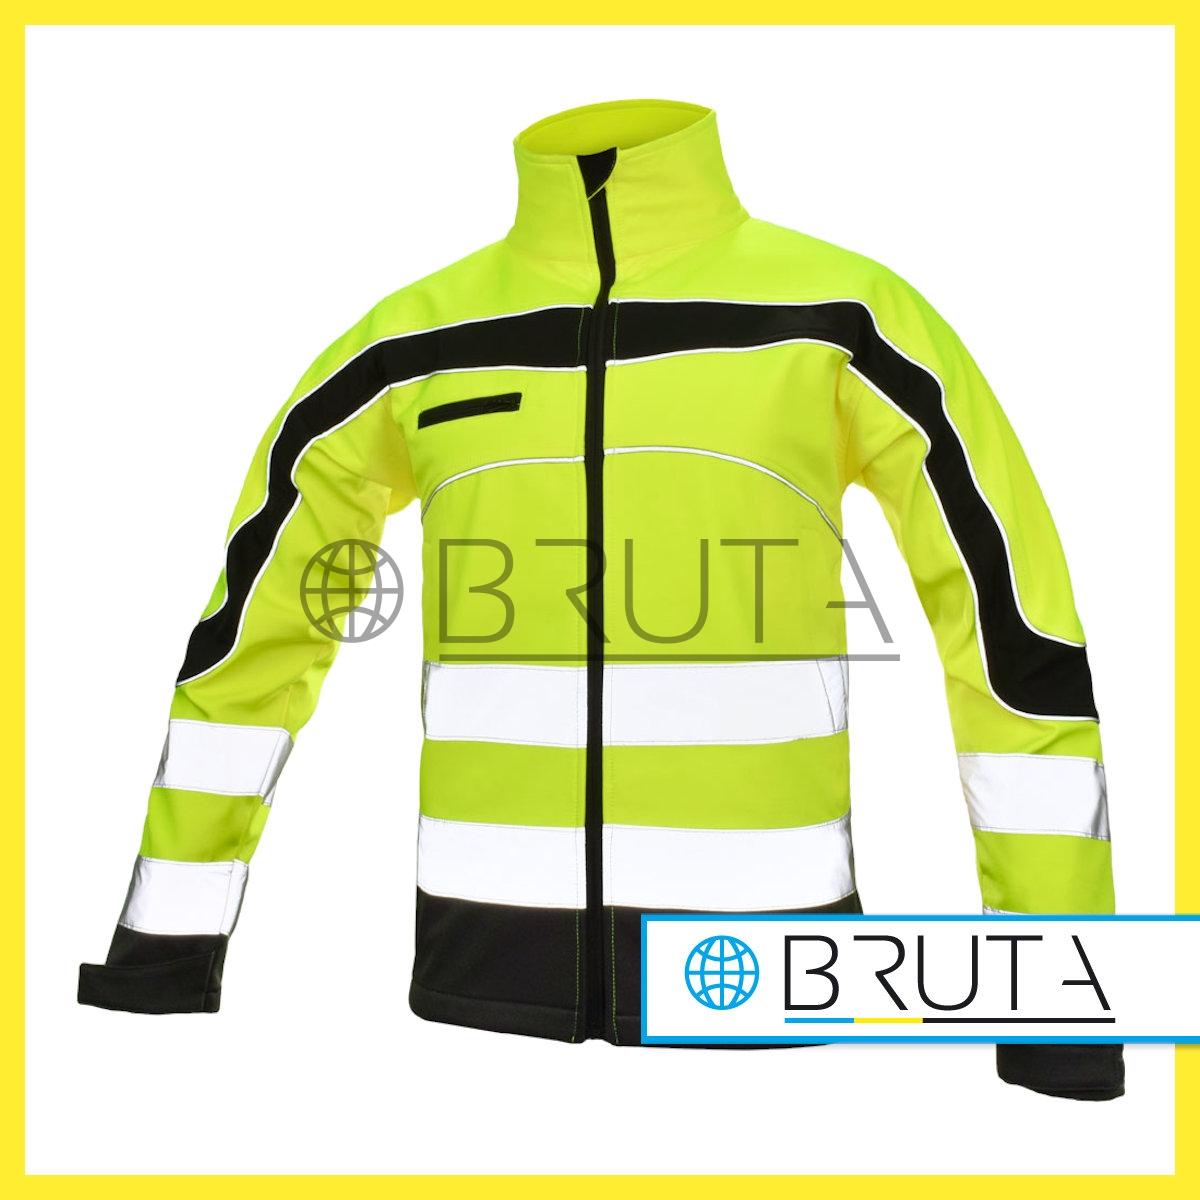 Kurtka Shoftshell Softflex, fluorescencyjna, pasy odblaskowe